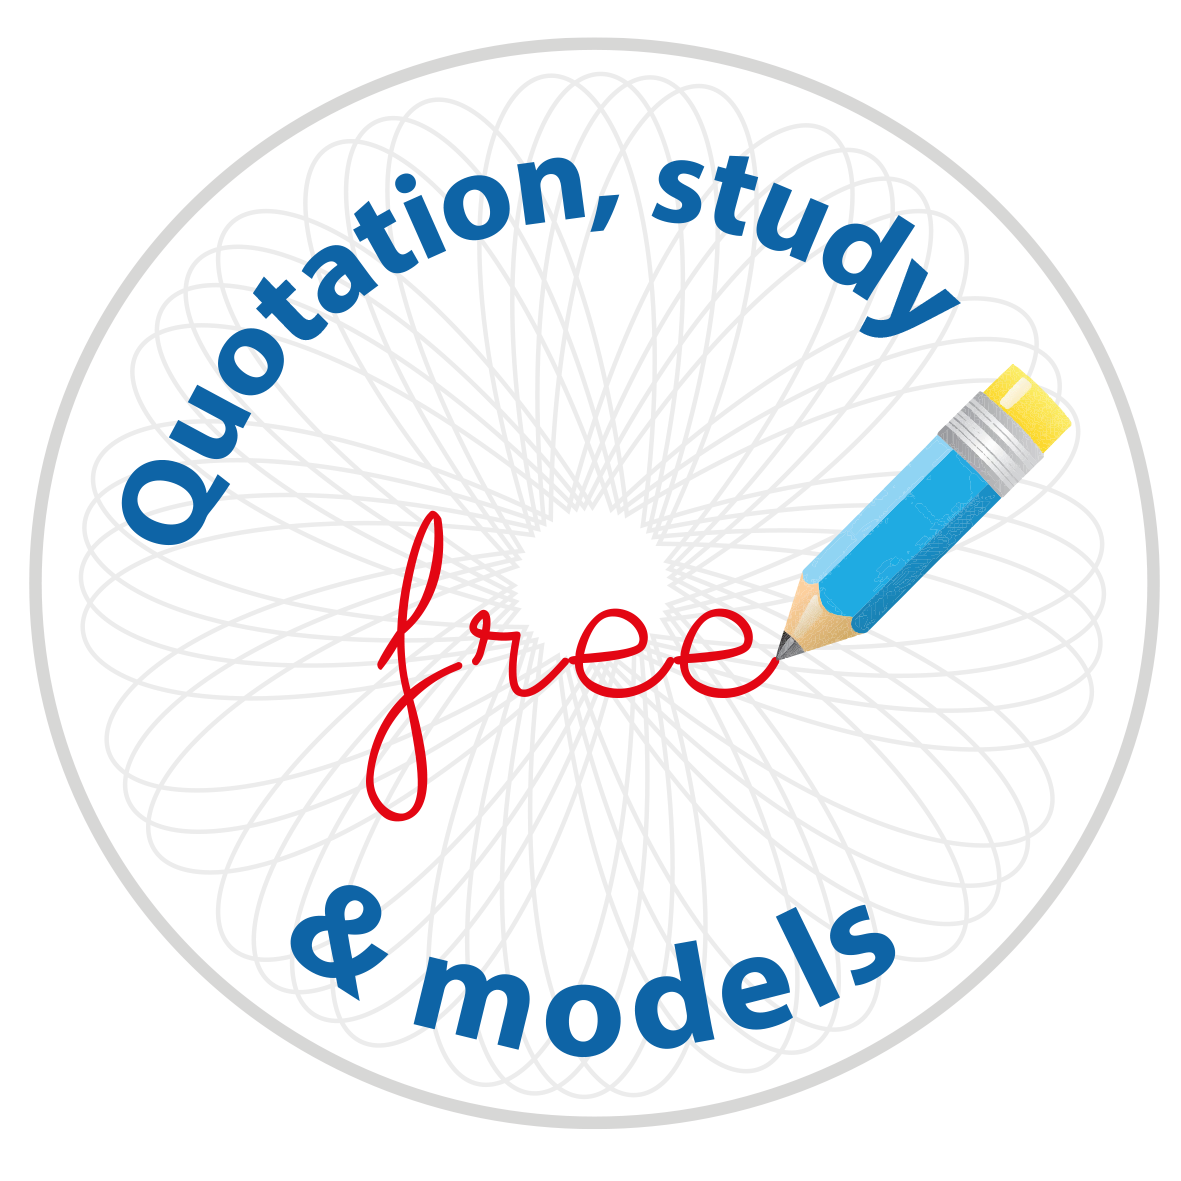 Free Quotation study model